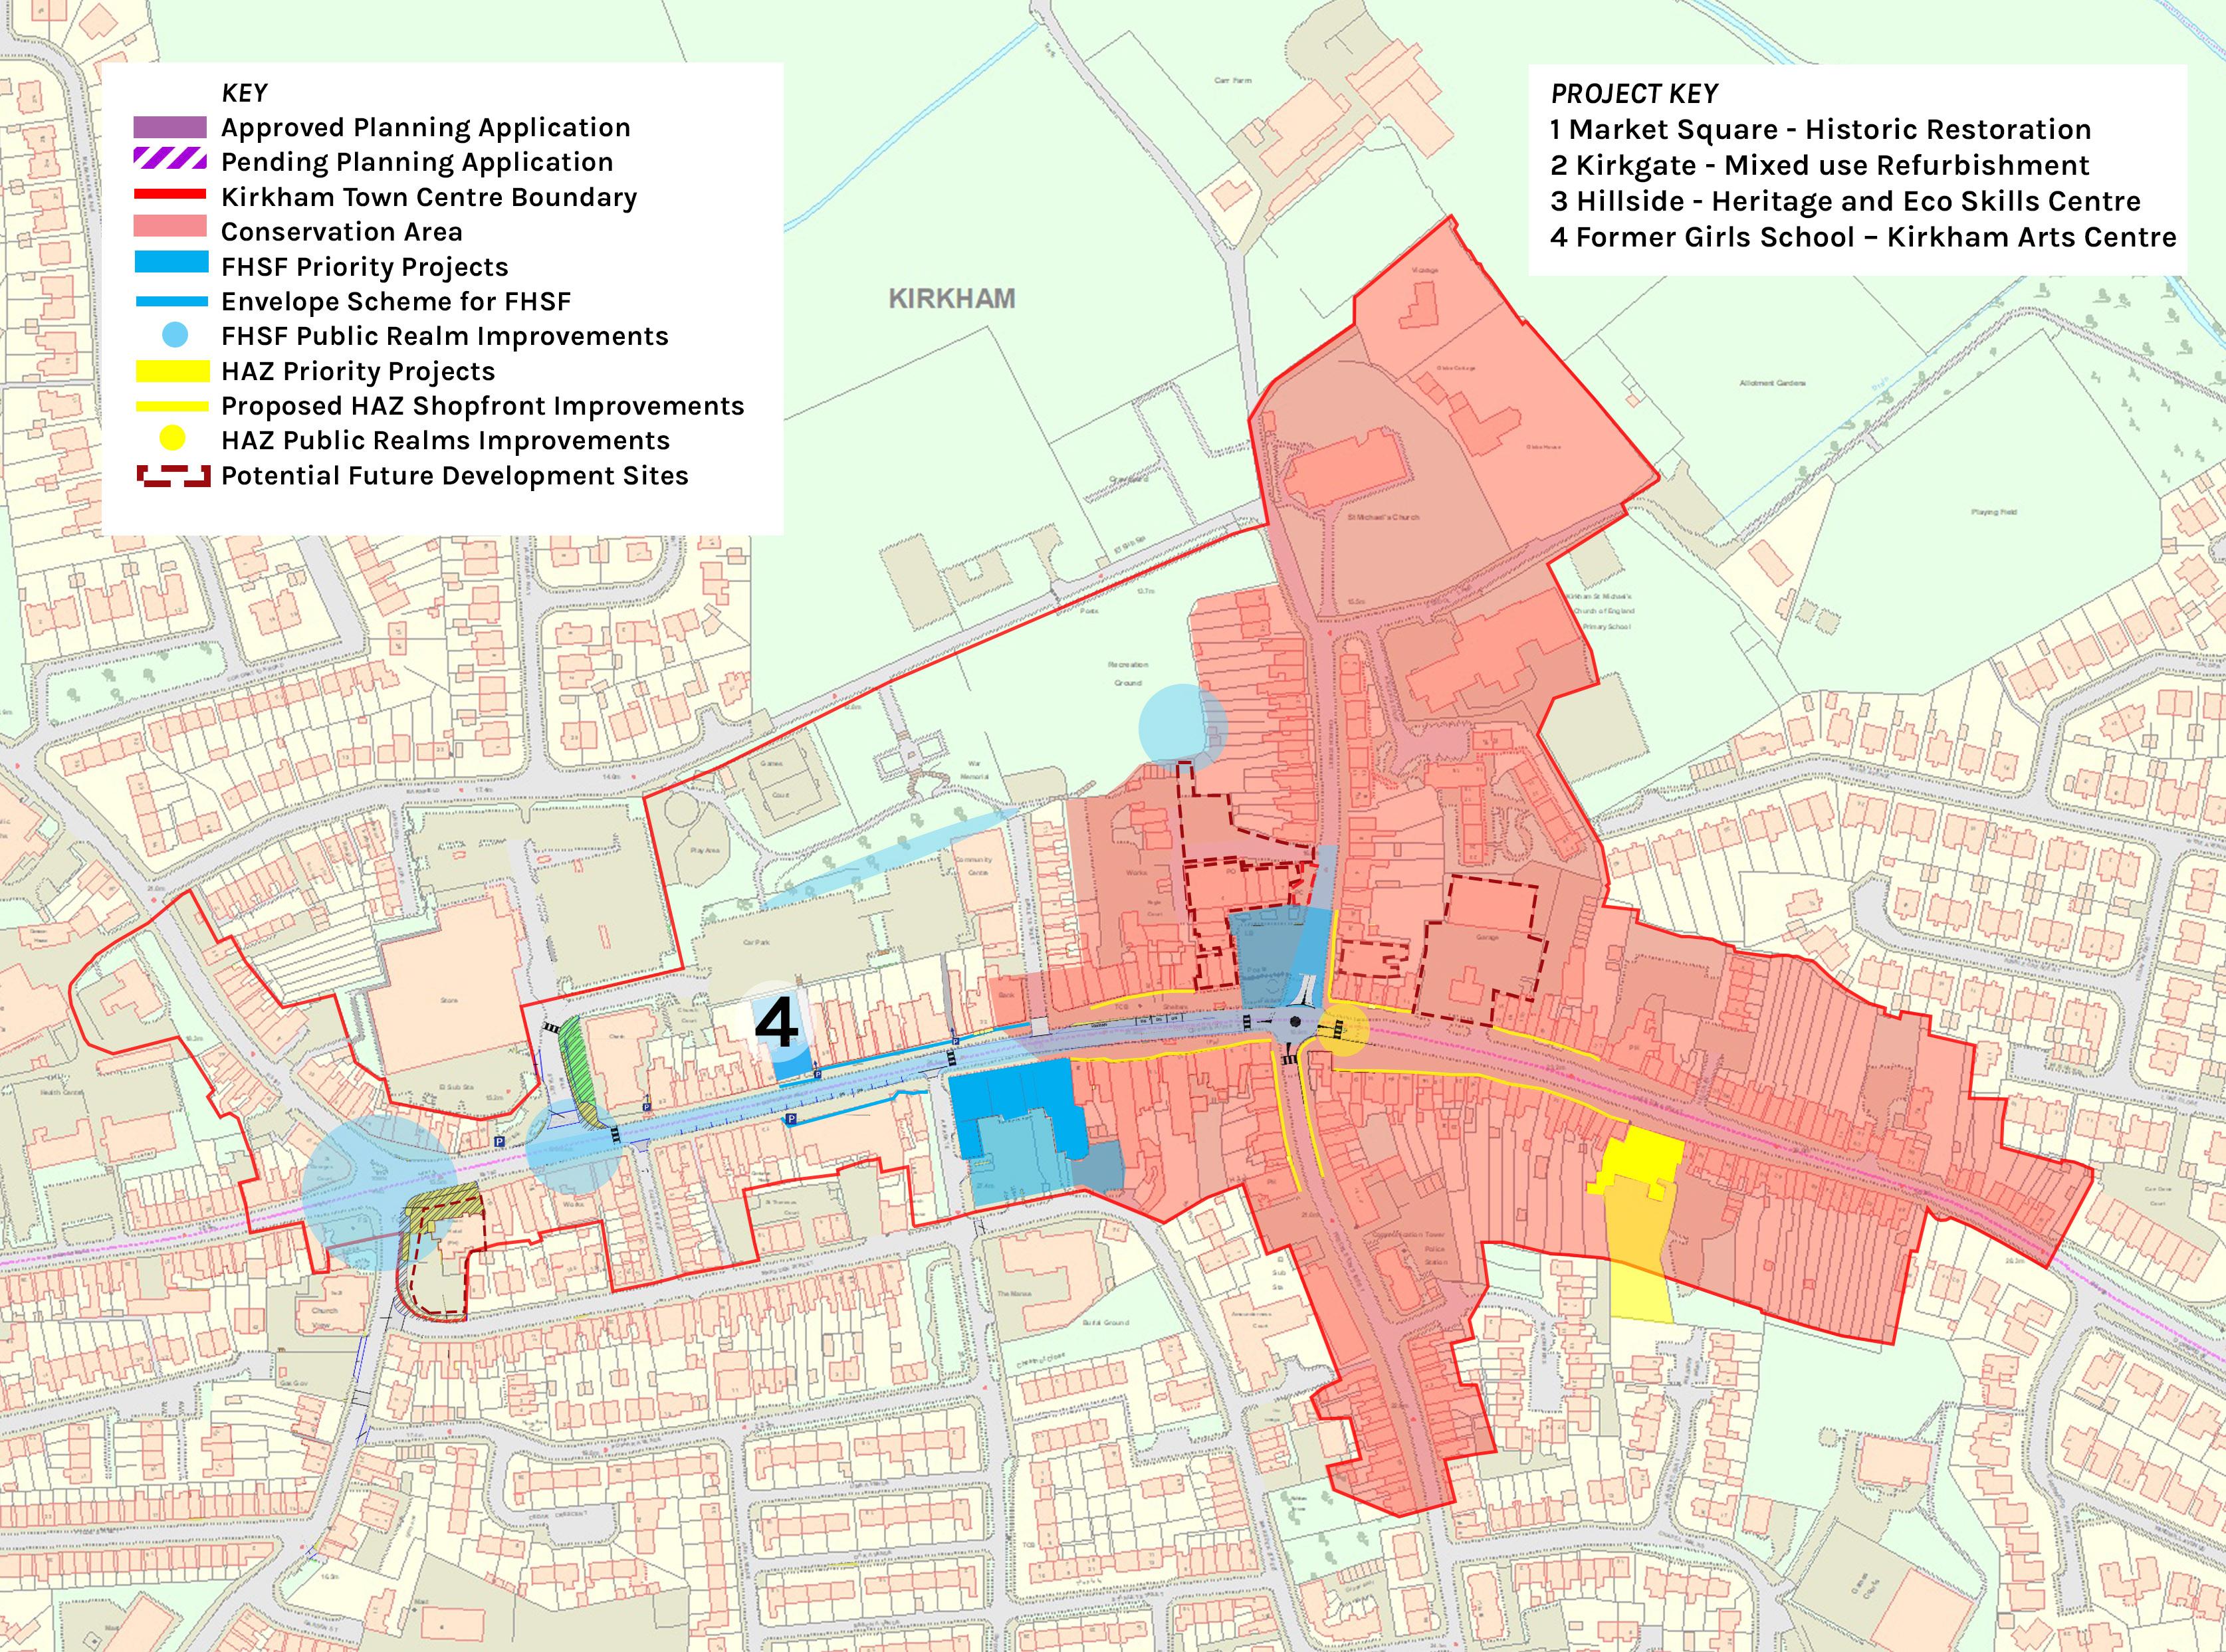 Location plan of Kirkham Arts & Heritage Centre/ Community Centre